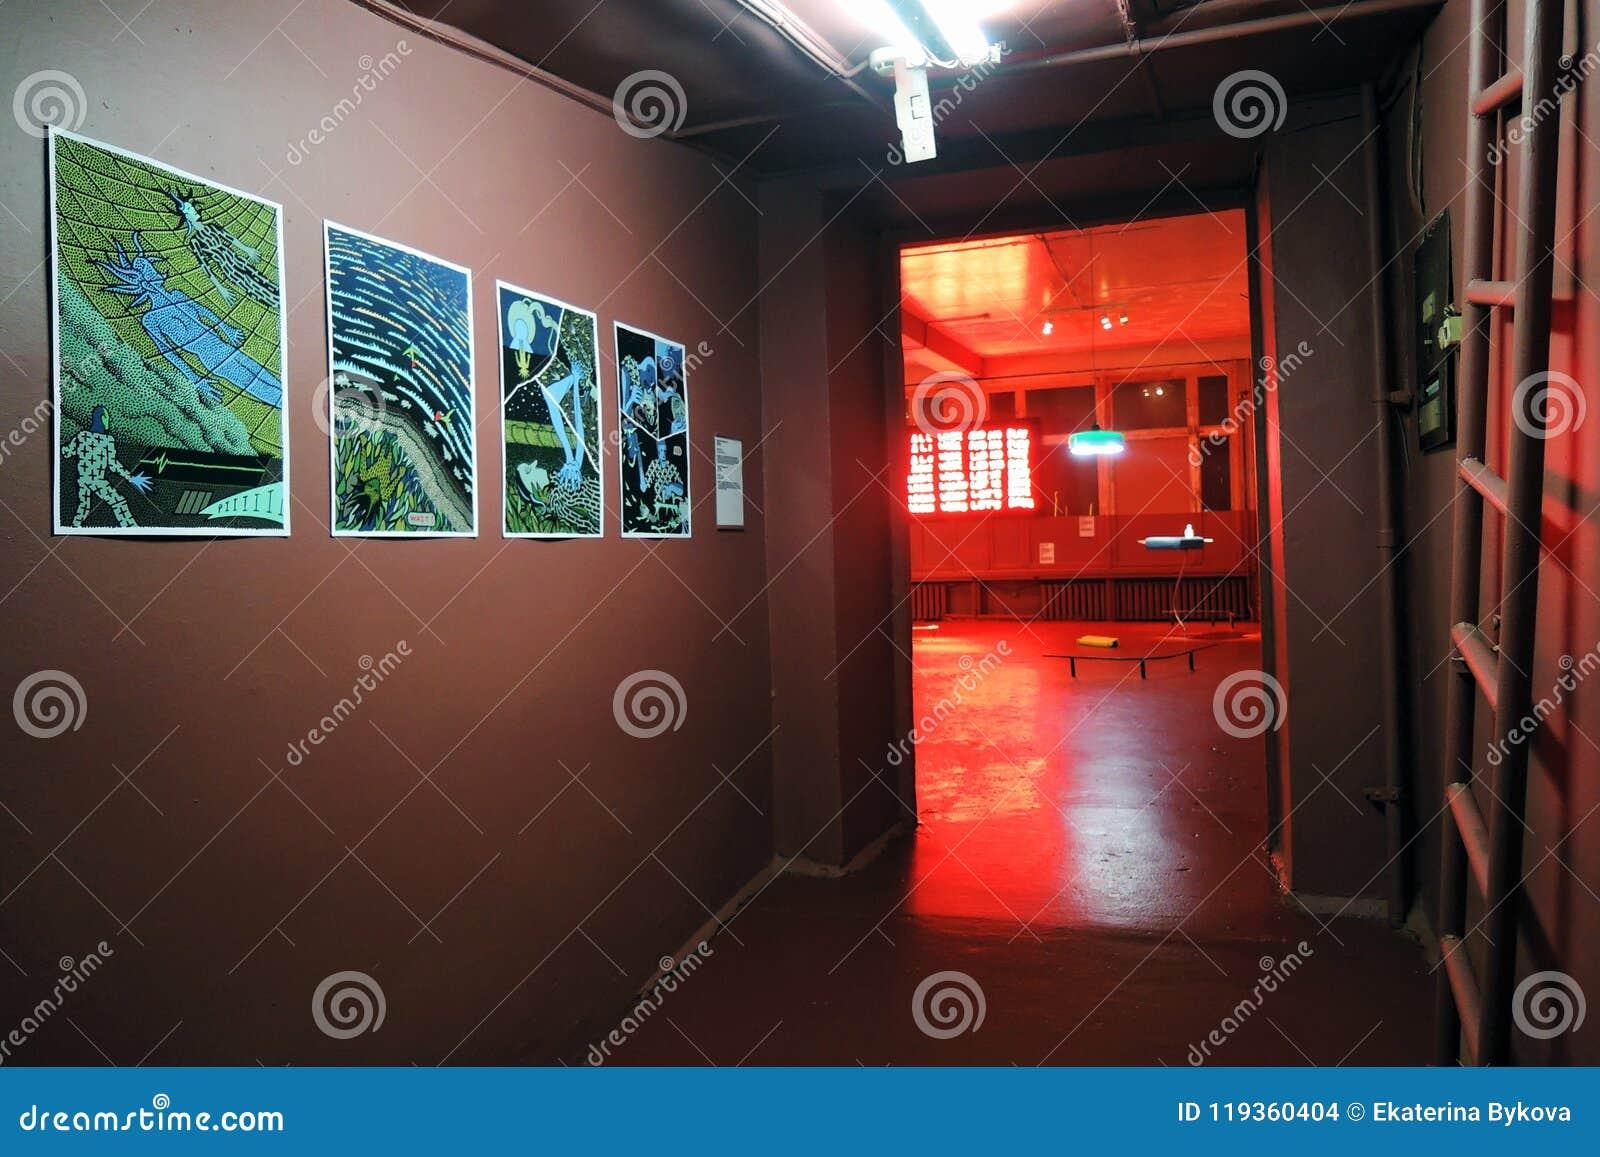 Simsalabim Youngart Internationell modern konst biennale i Moskva